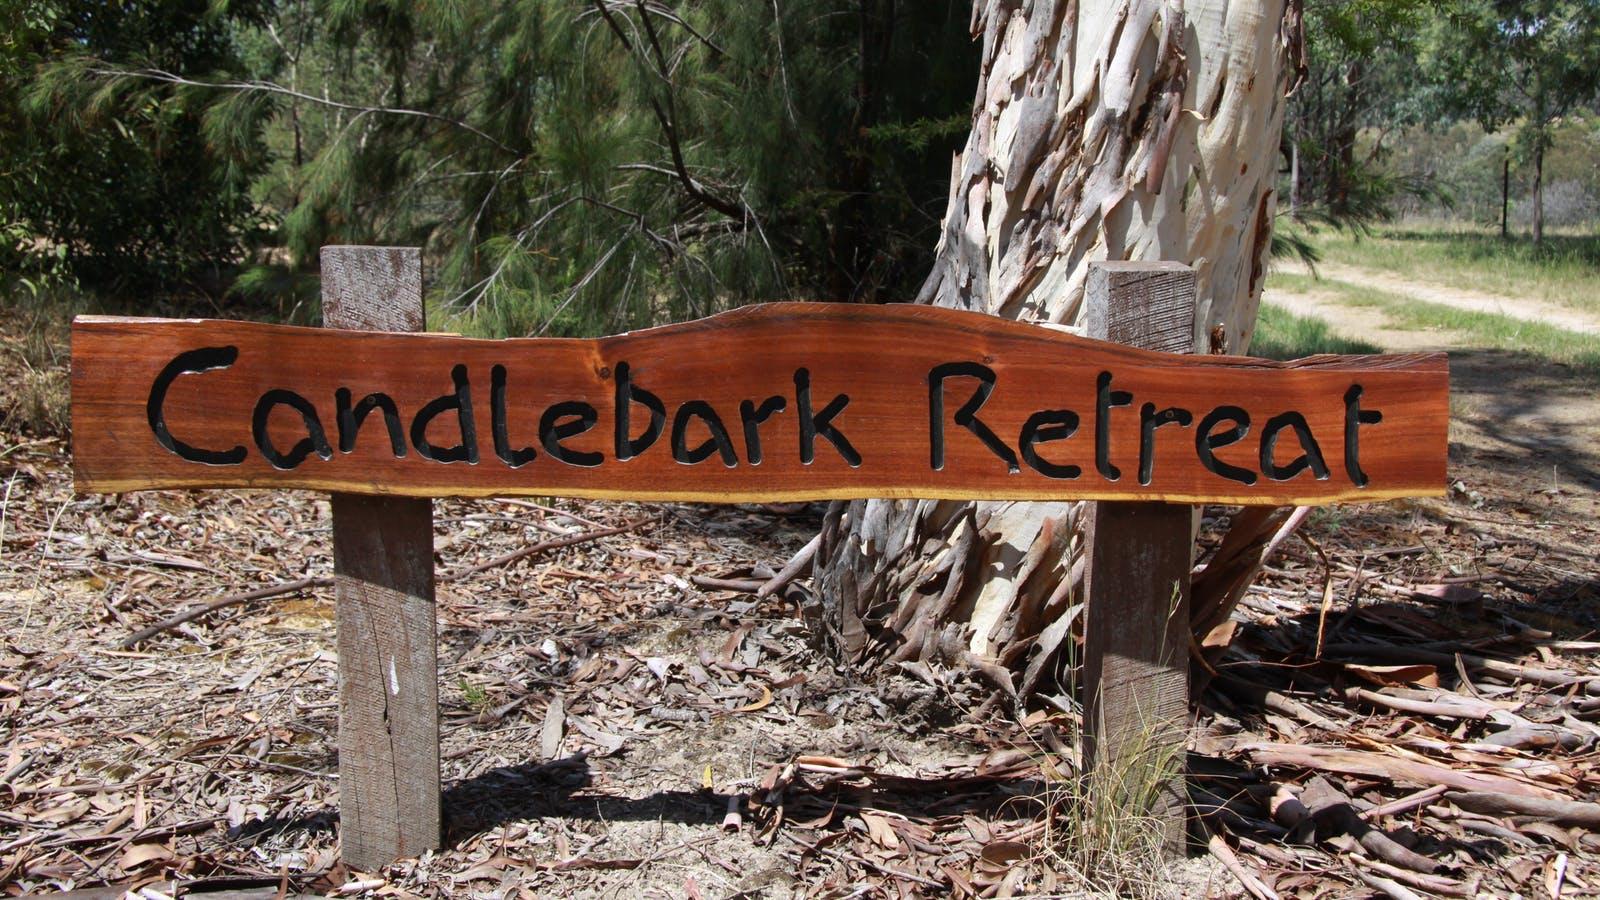 Welcome to Candlebark Retreat